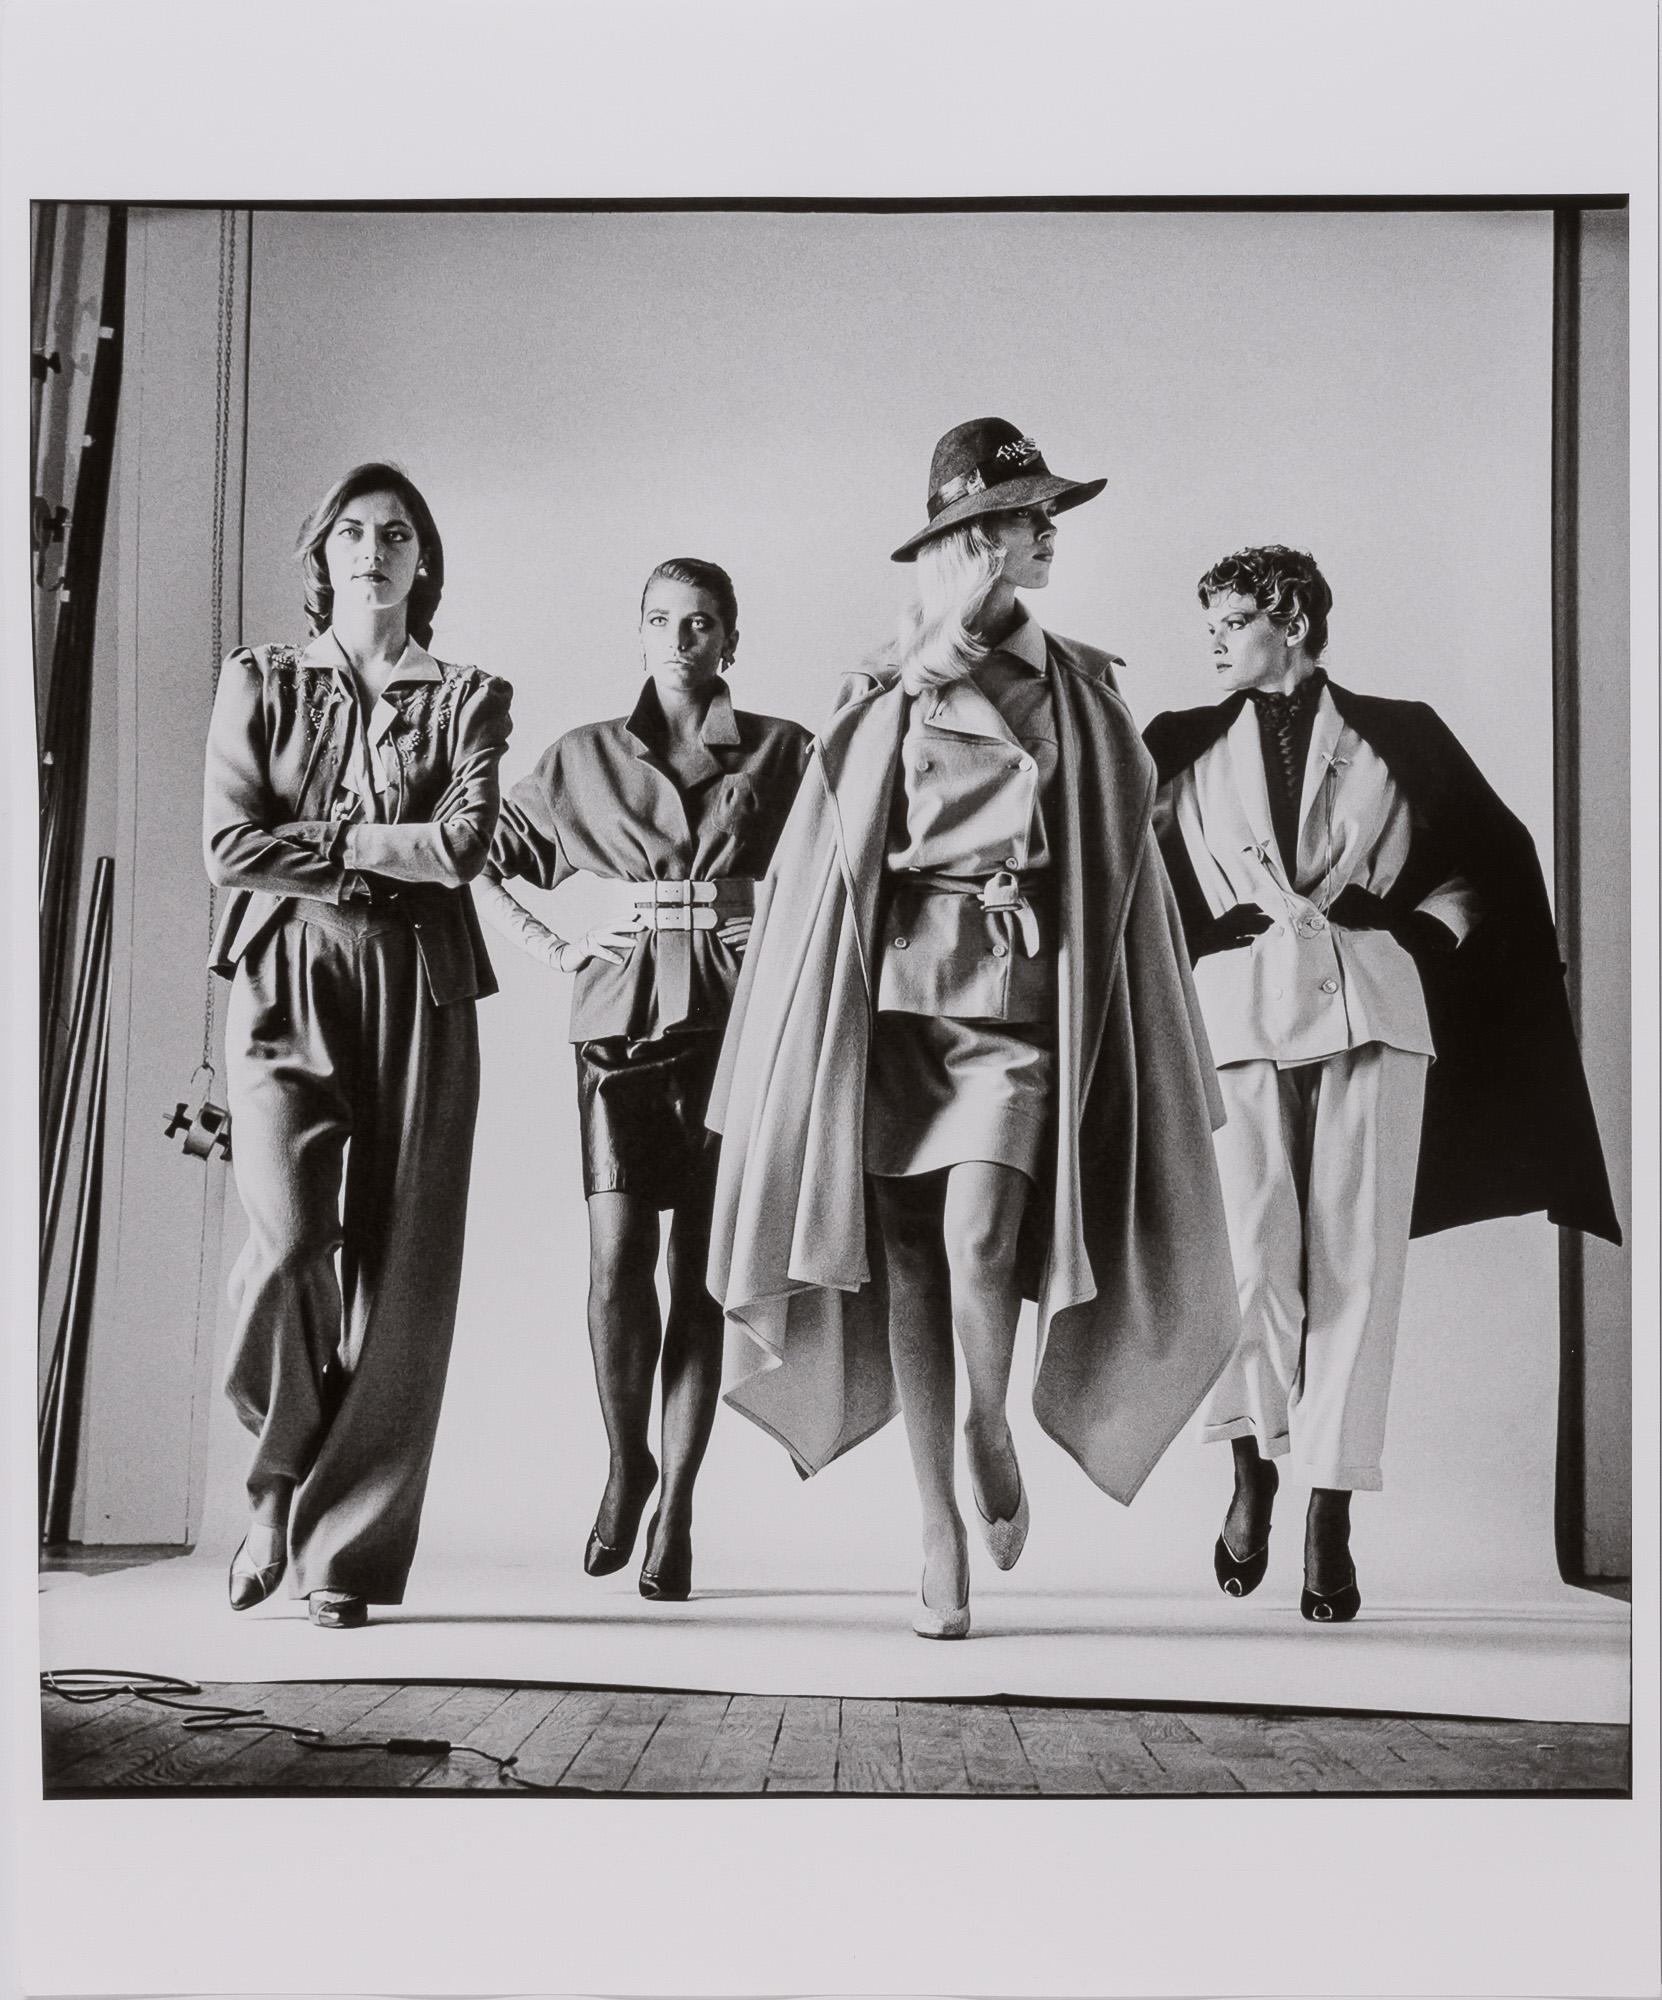 HELMUT NEWTON (1920-2004) , Sie Kommen, Dressed and Naked